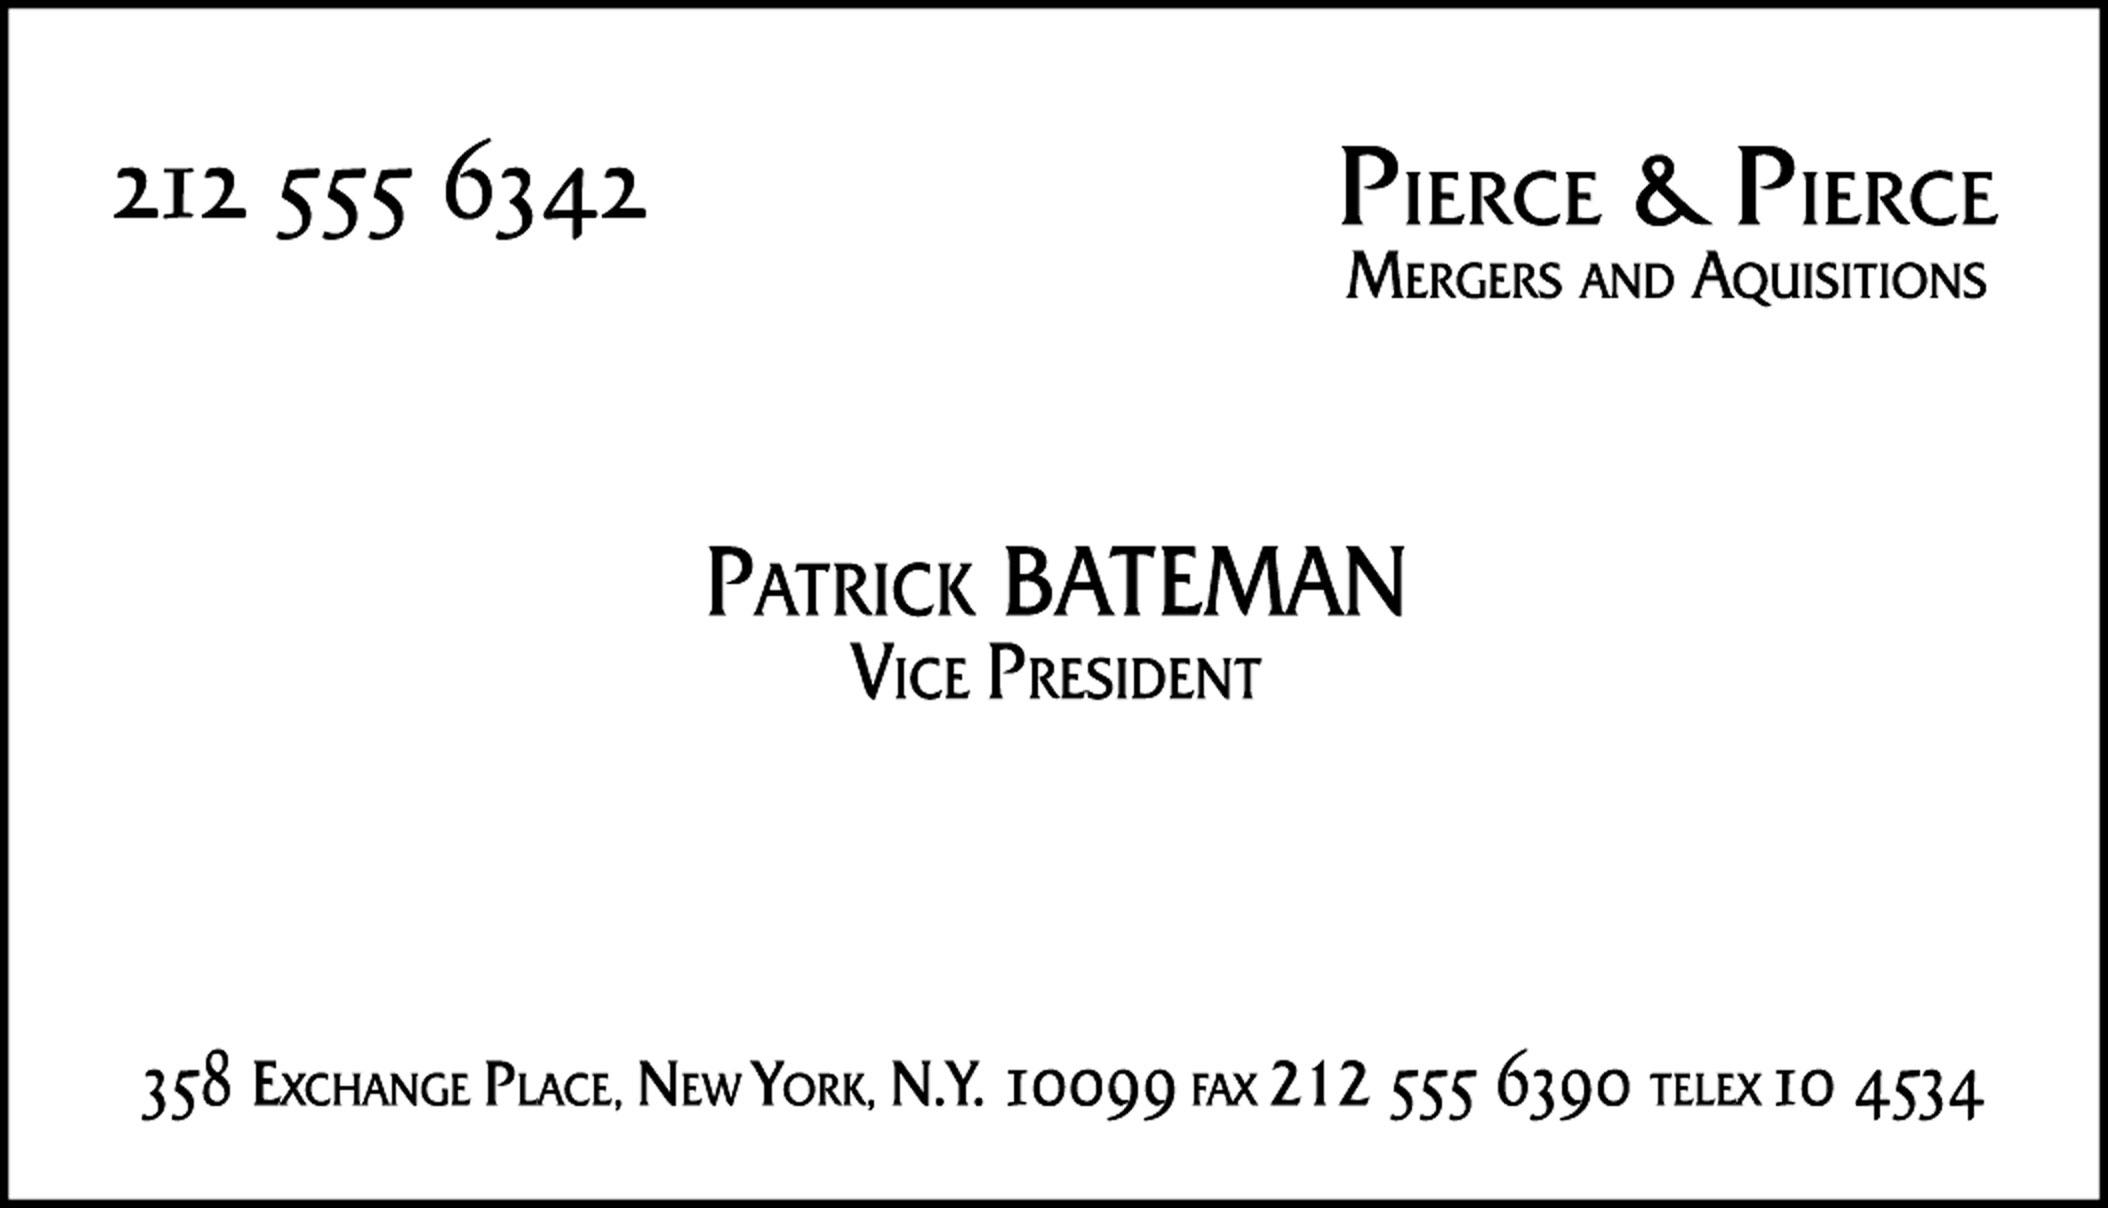 100th post top 100 movie props memorabilia plus free for Patrick bateman business cards